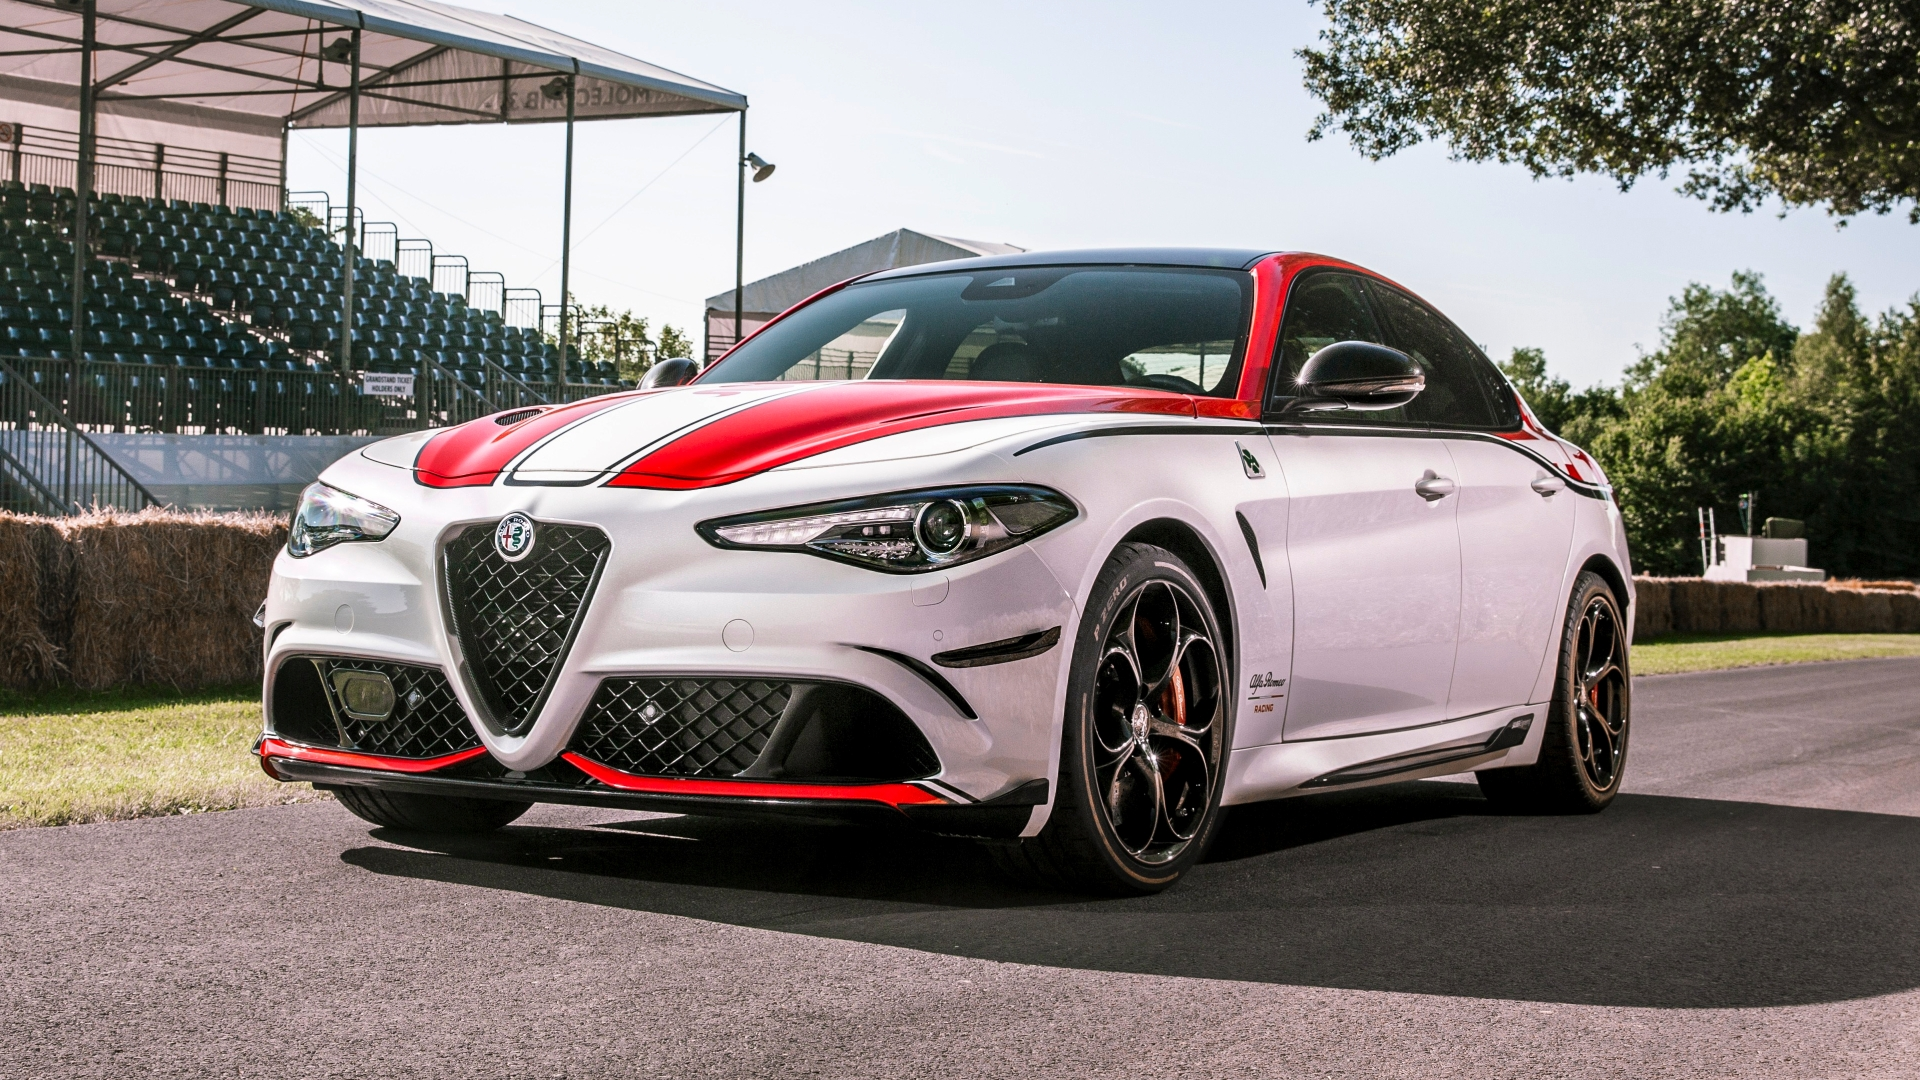 Alfa Romeo readying 462kW Giulia GTA - report - Redline